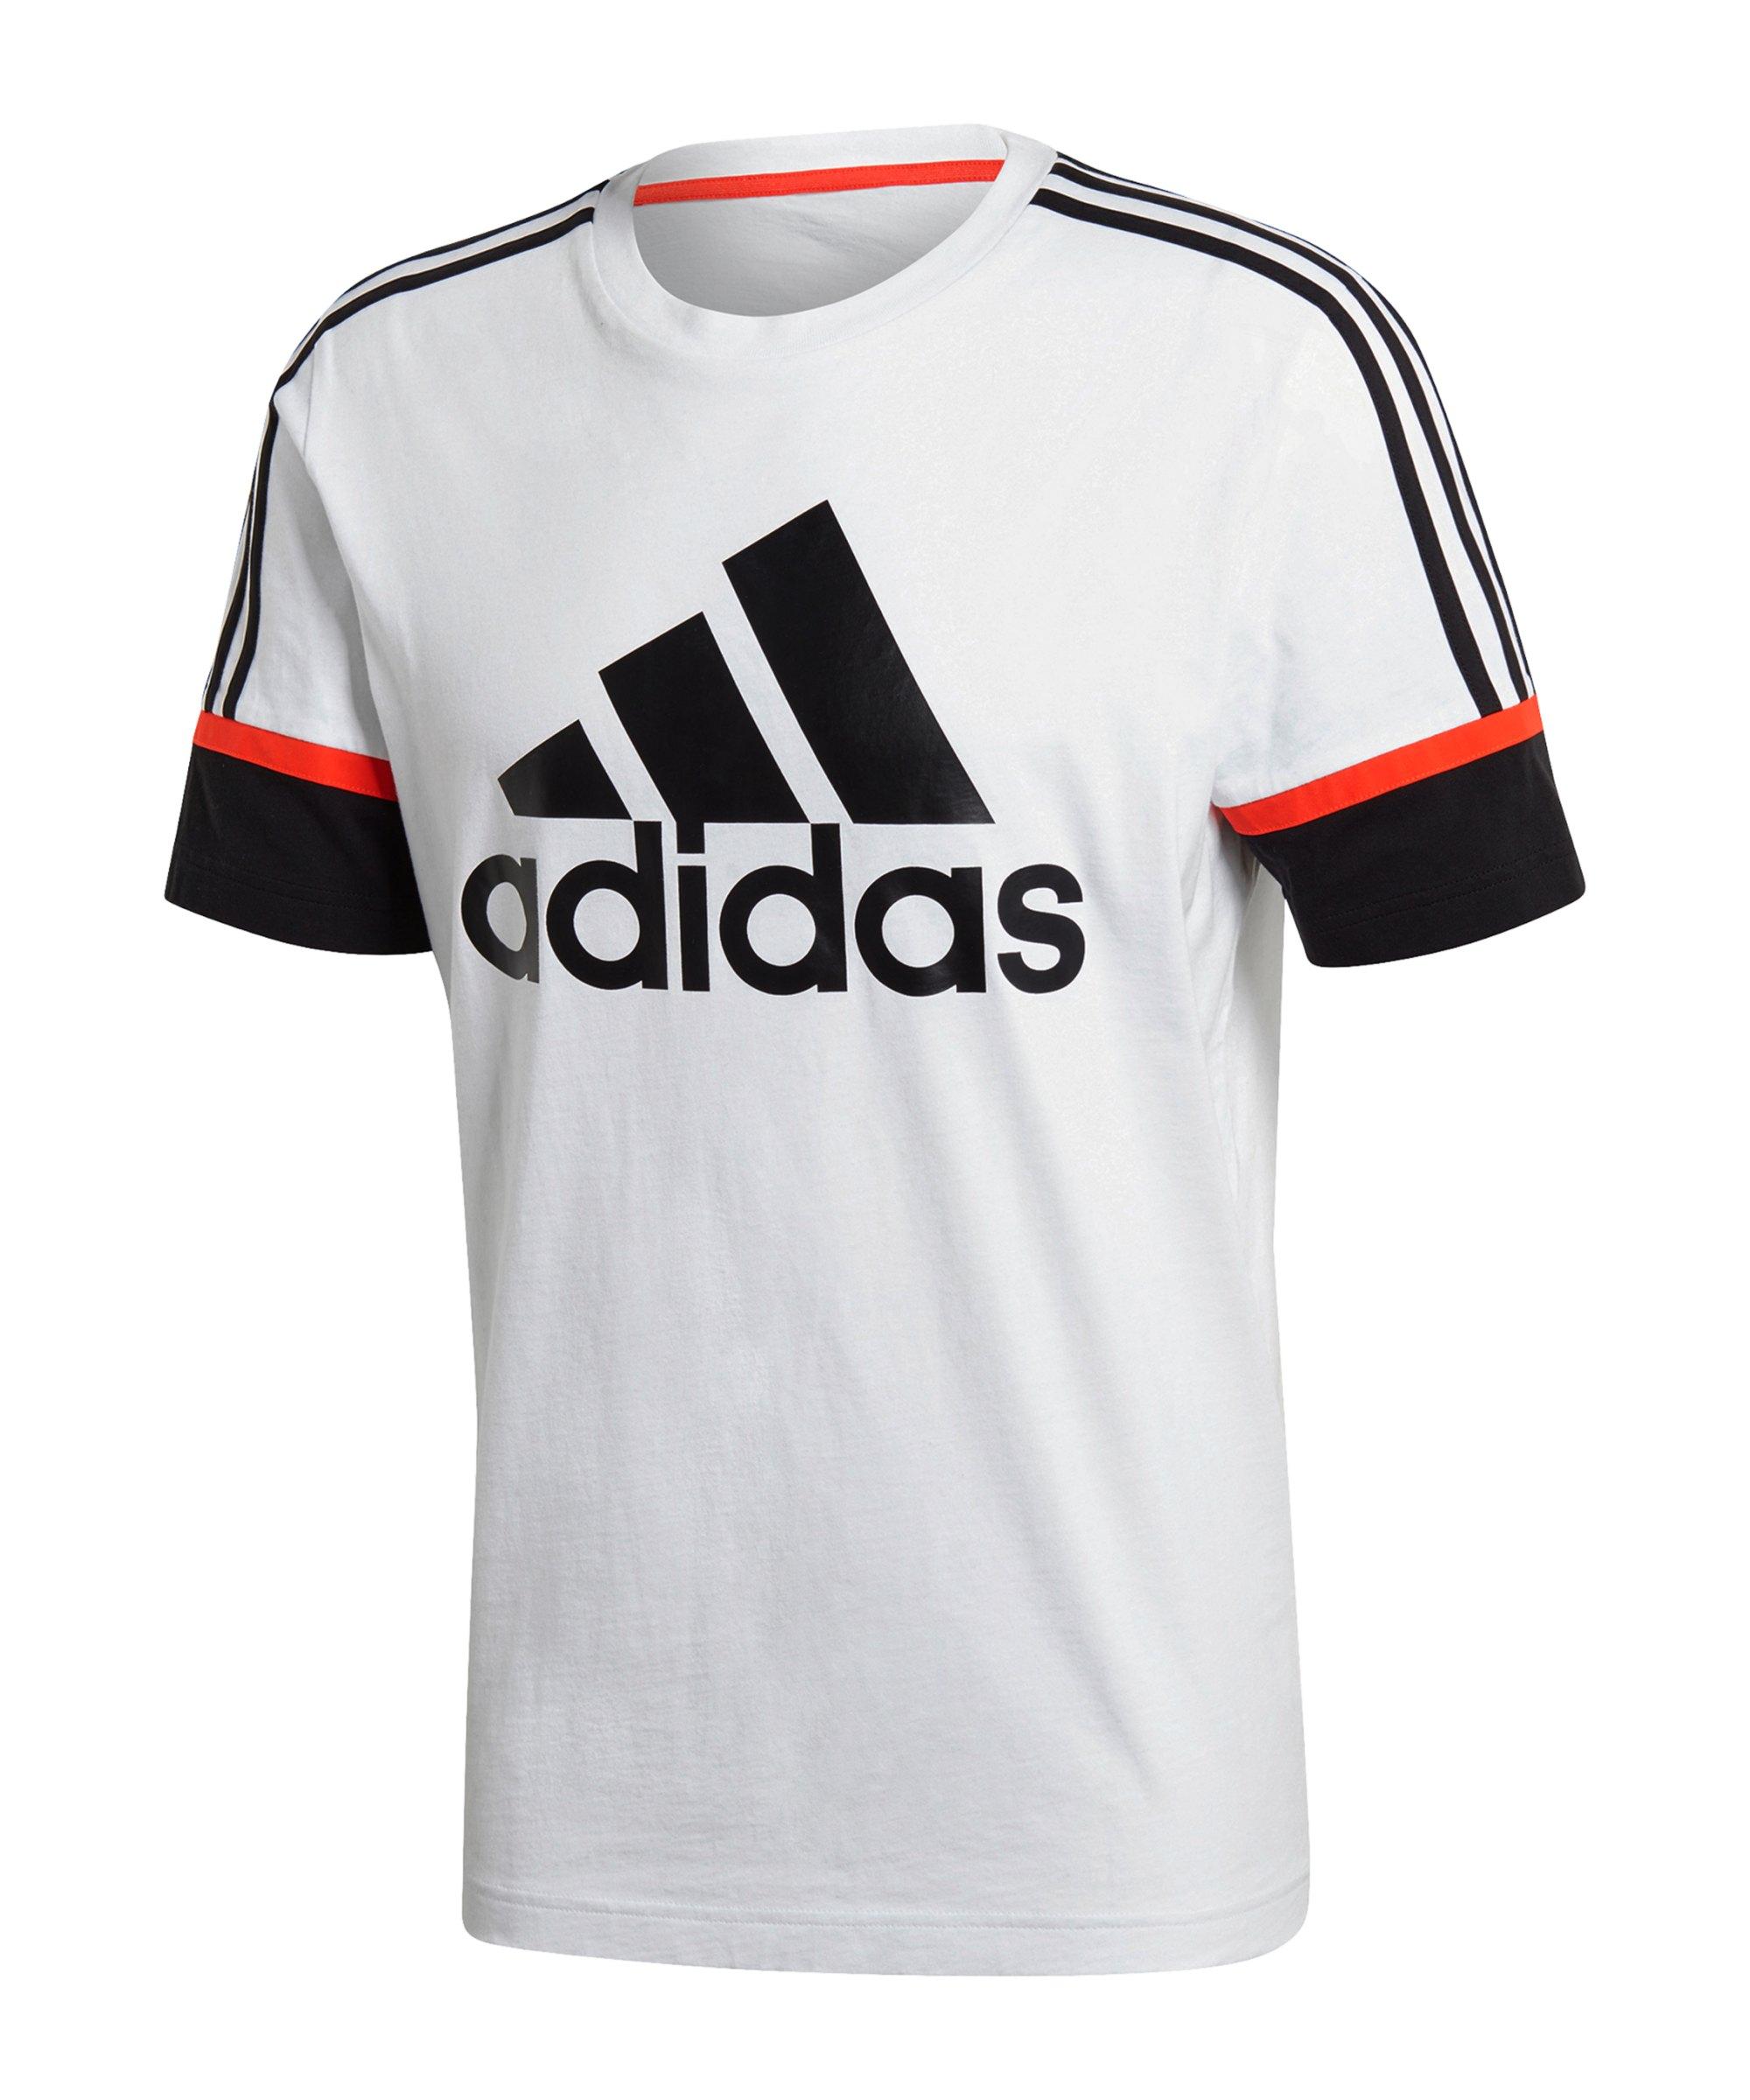 adidas OSR Logo Graphic T-Shirt Weiss Schwarz - weiss